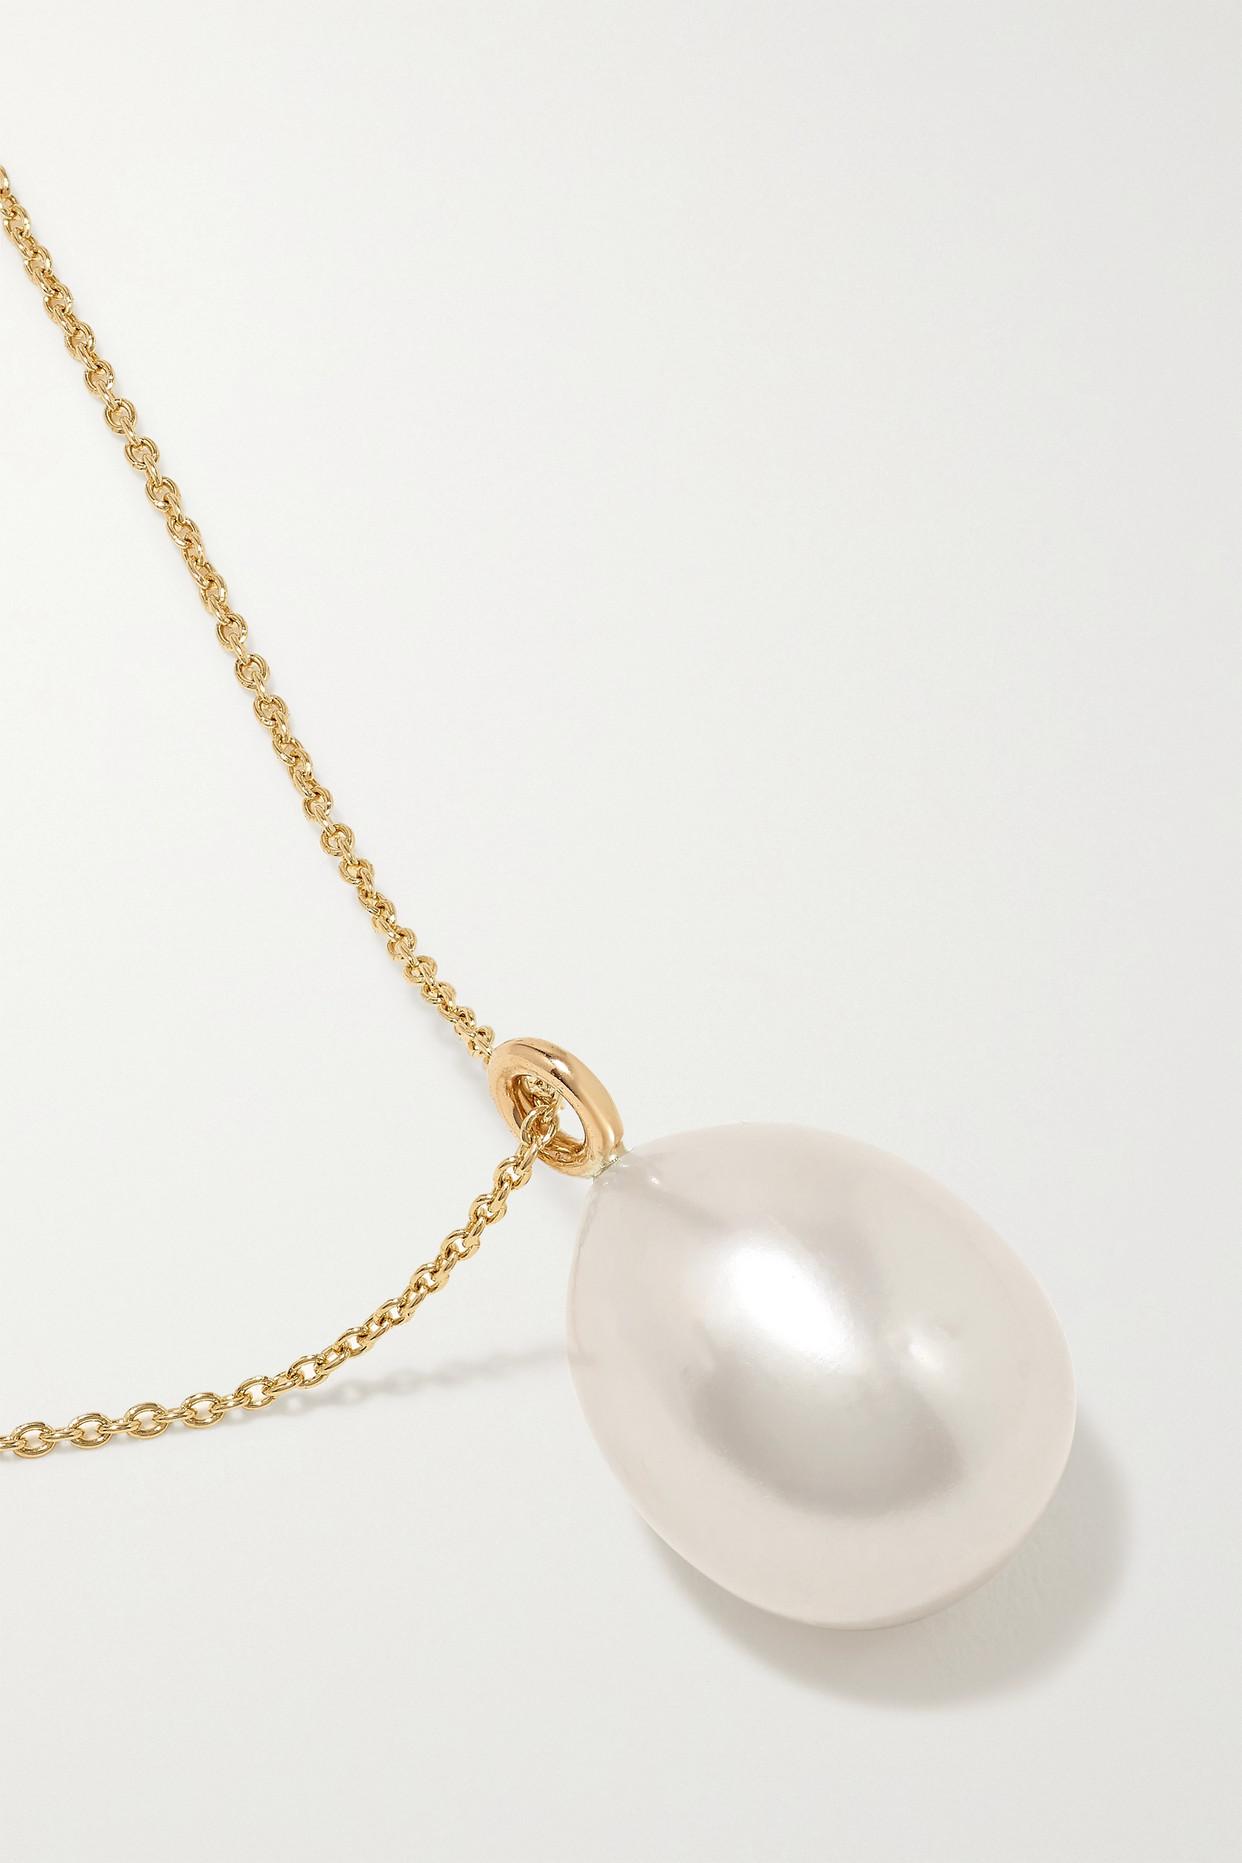 Sophie Bille Brahe L'eau 14-karat Gold Pearl Necklace